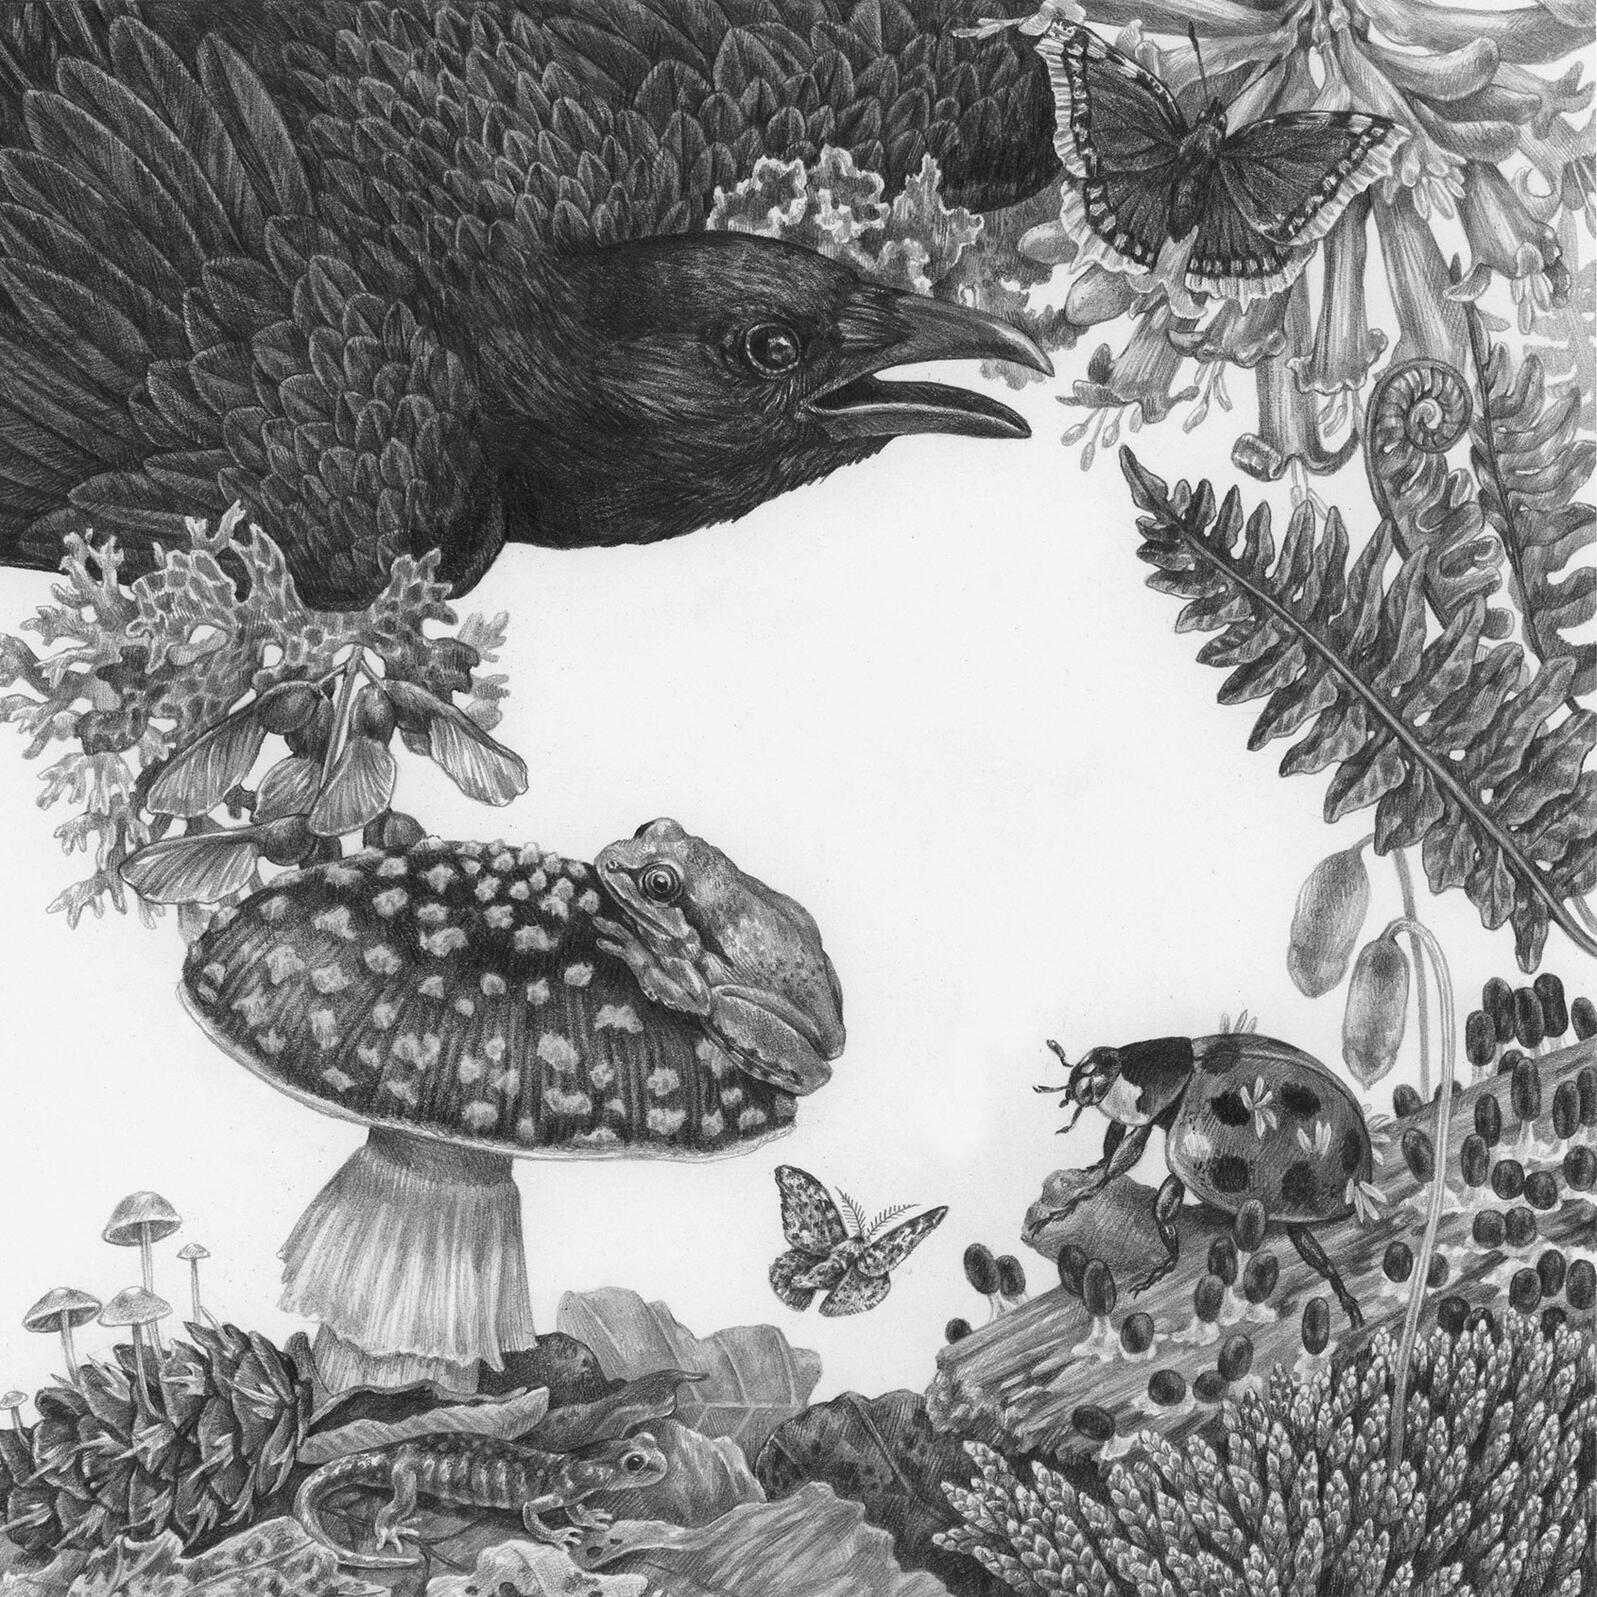 Art from Nature Obscura: A City's Hidden Natural World, by Kelly Brenner. Illustration: Zoe Keller